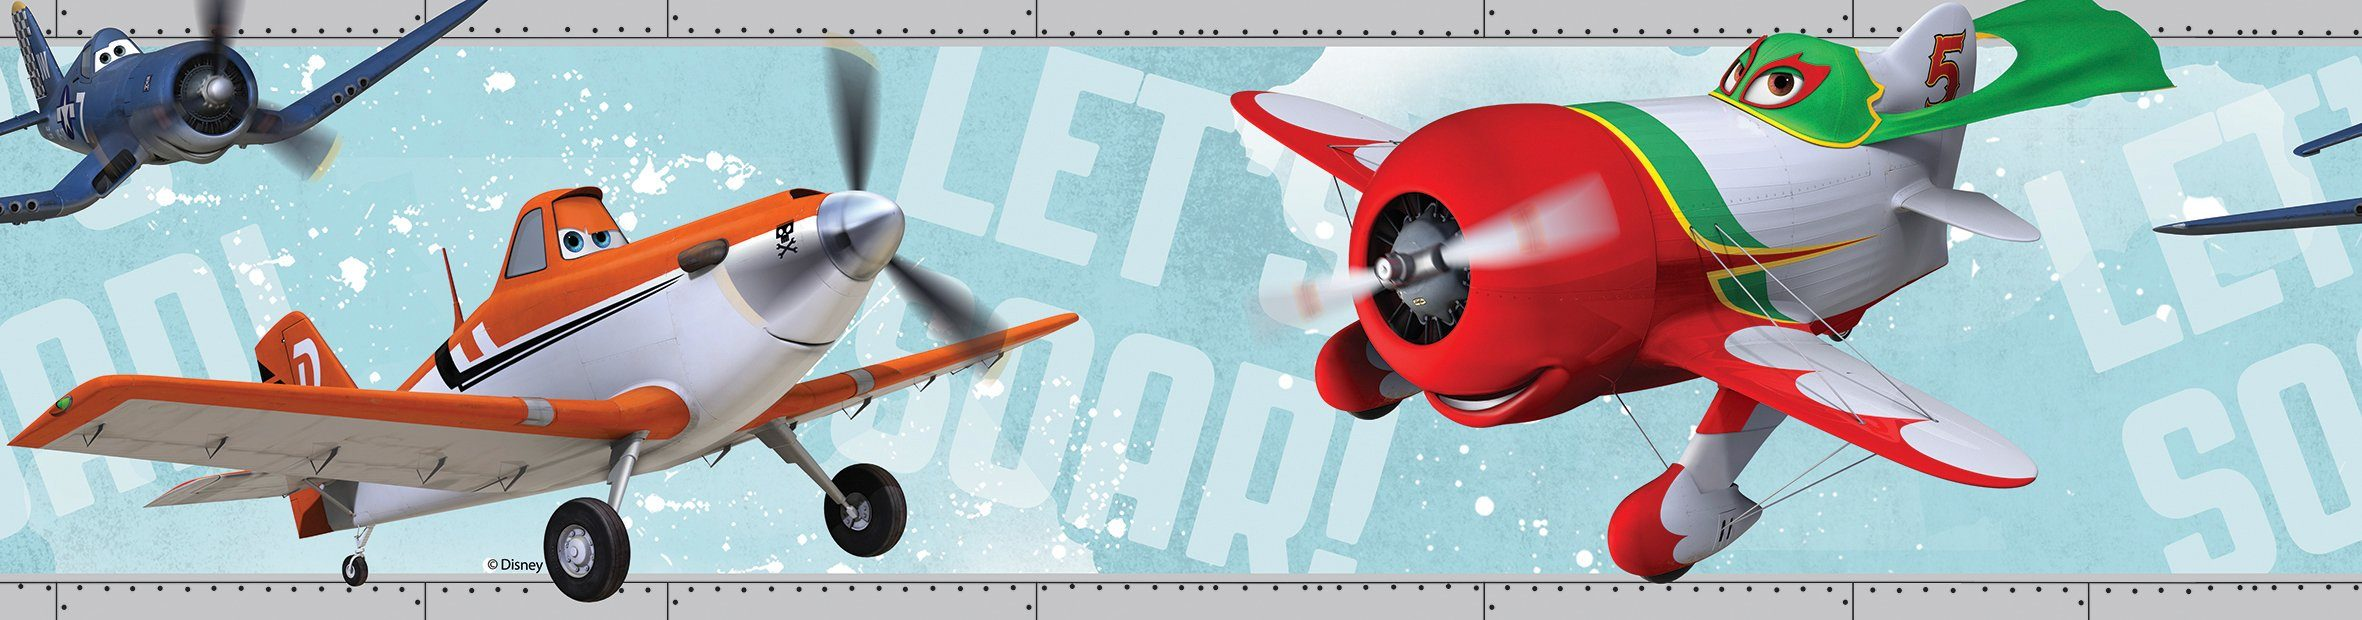 GRAHAM & BROWN Papiertapete »Disney Planes Bordüre«